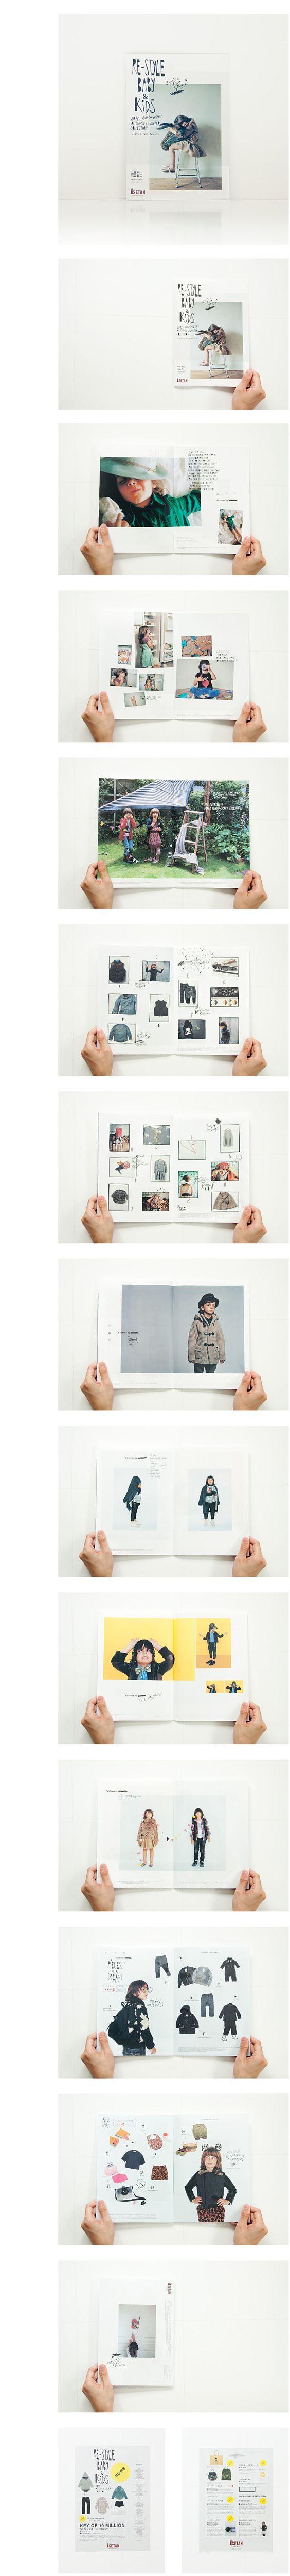 Magazine - Re-Style Baby & Kids - Enfants - Mode: